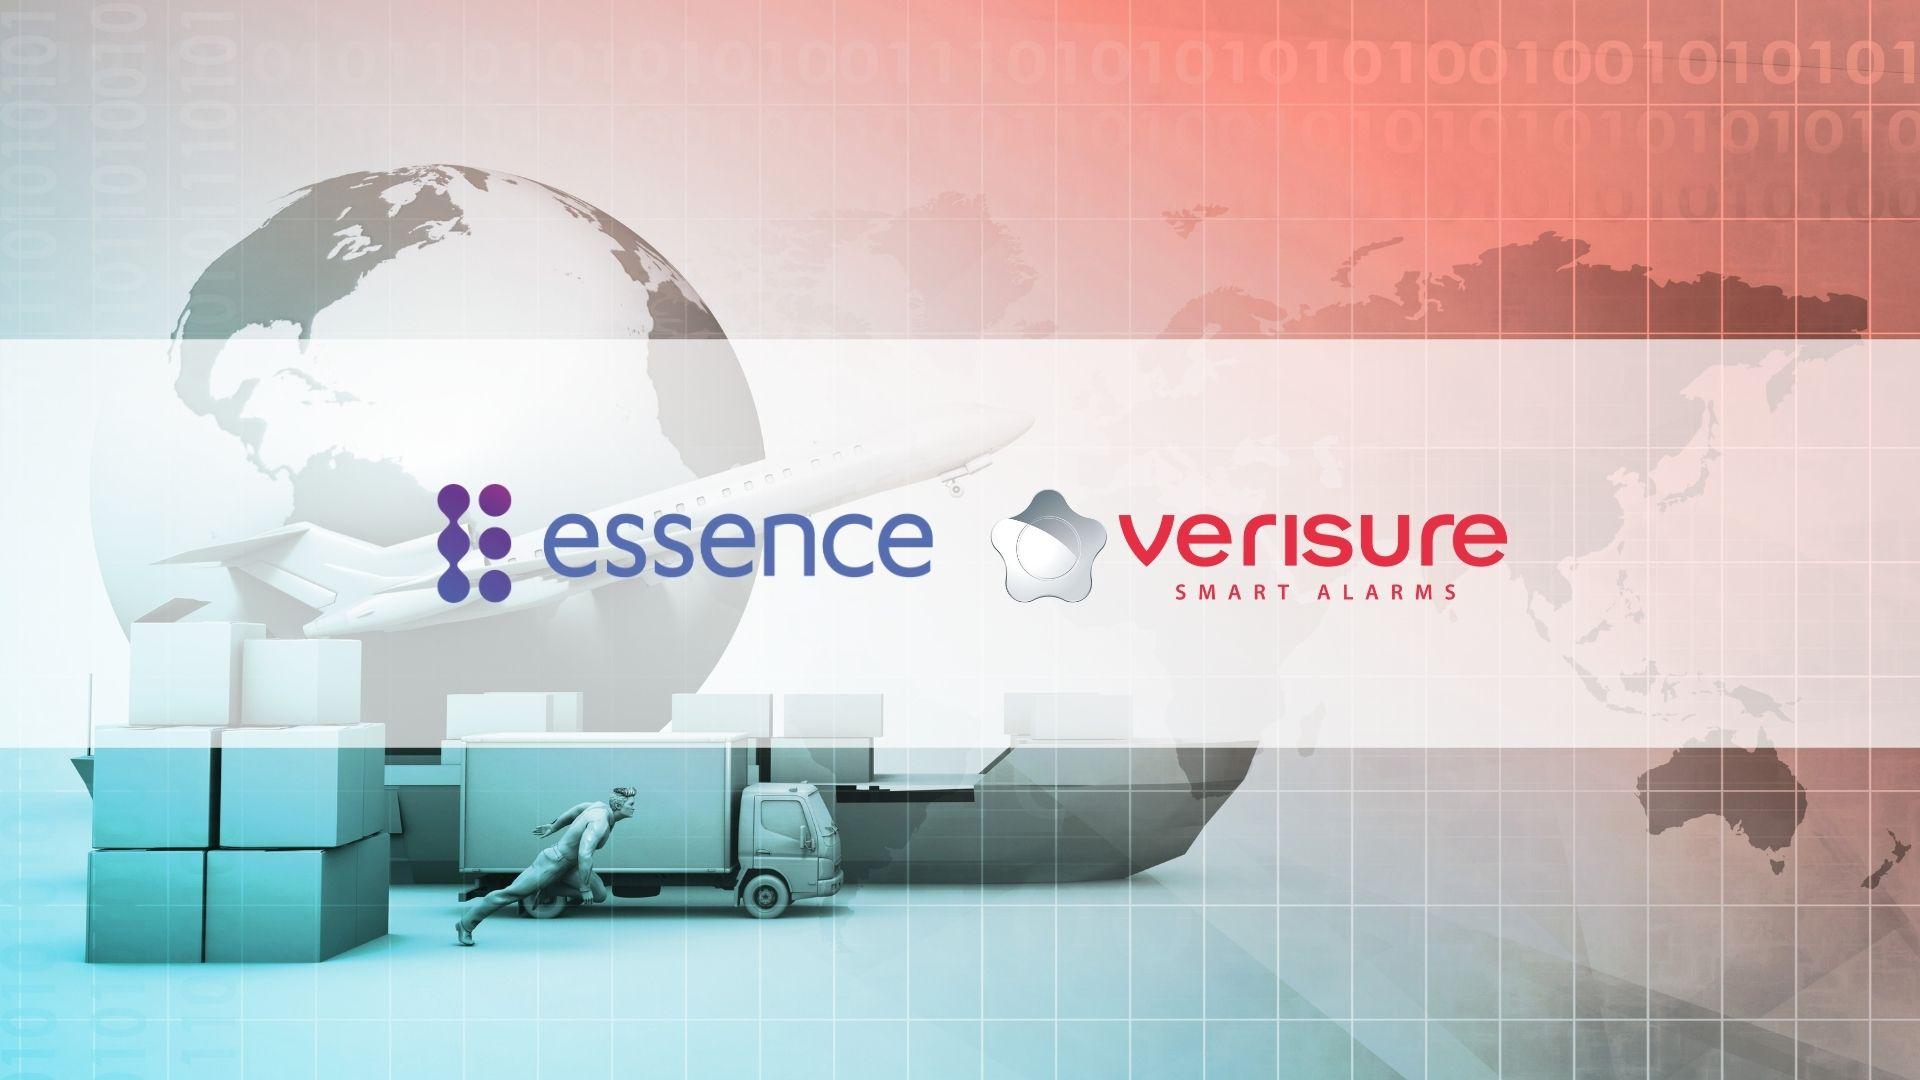 Essence and Verisure partnership